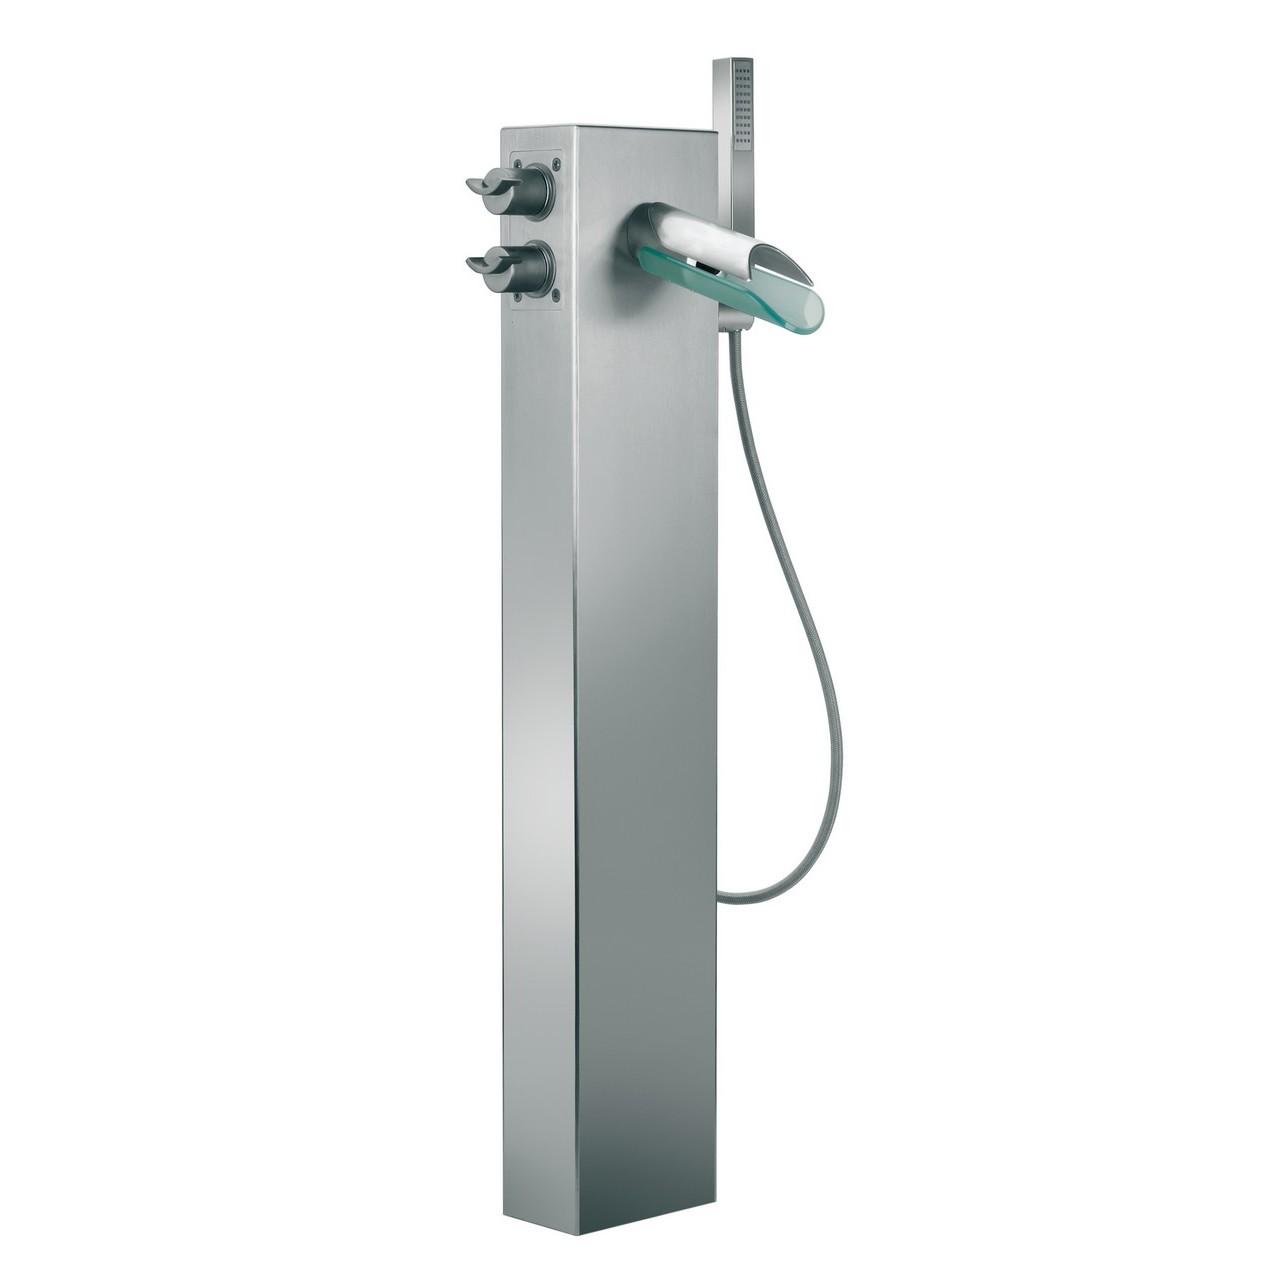 Paini bath system MORGANA 136